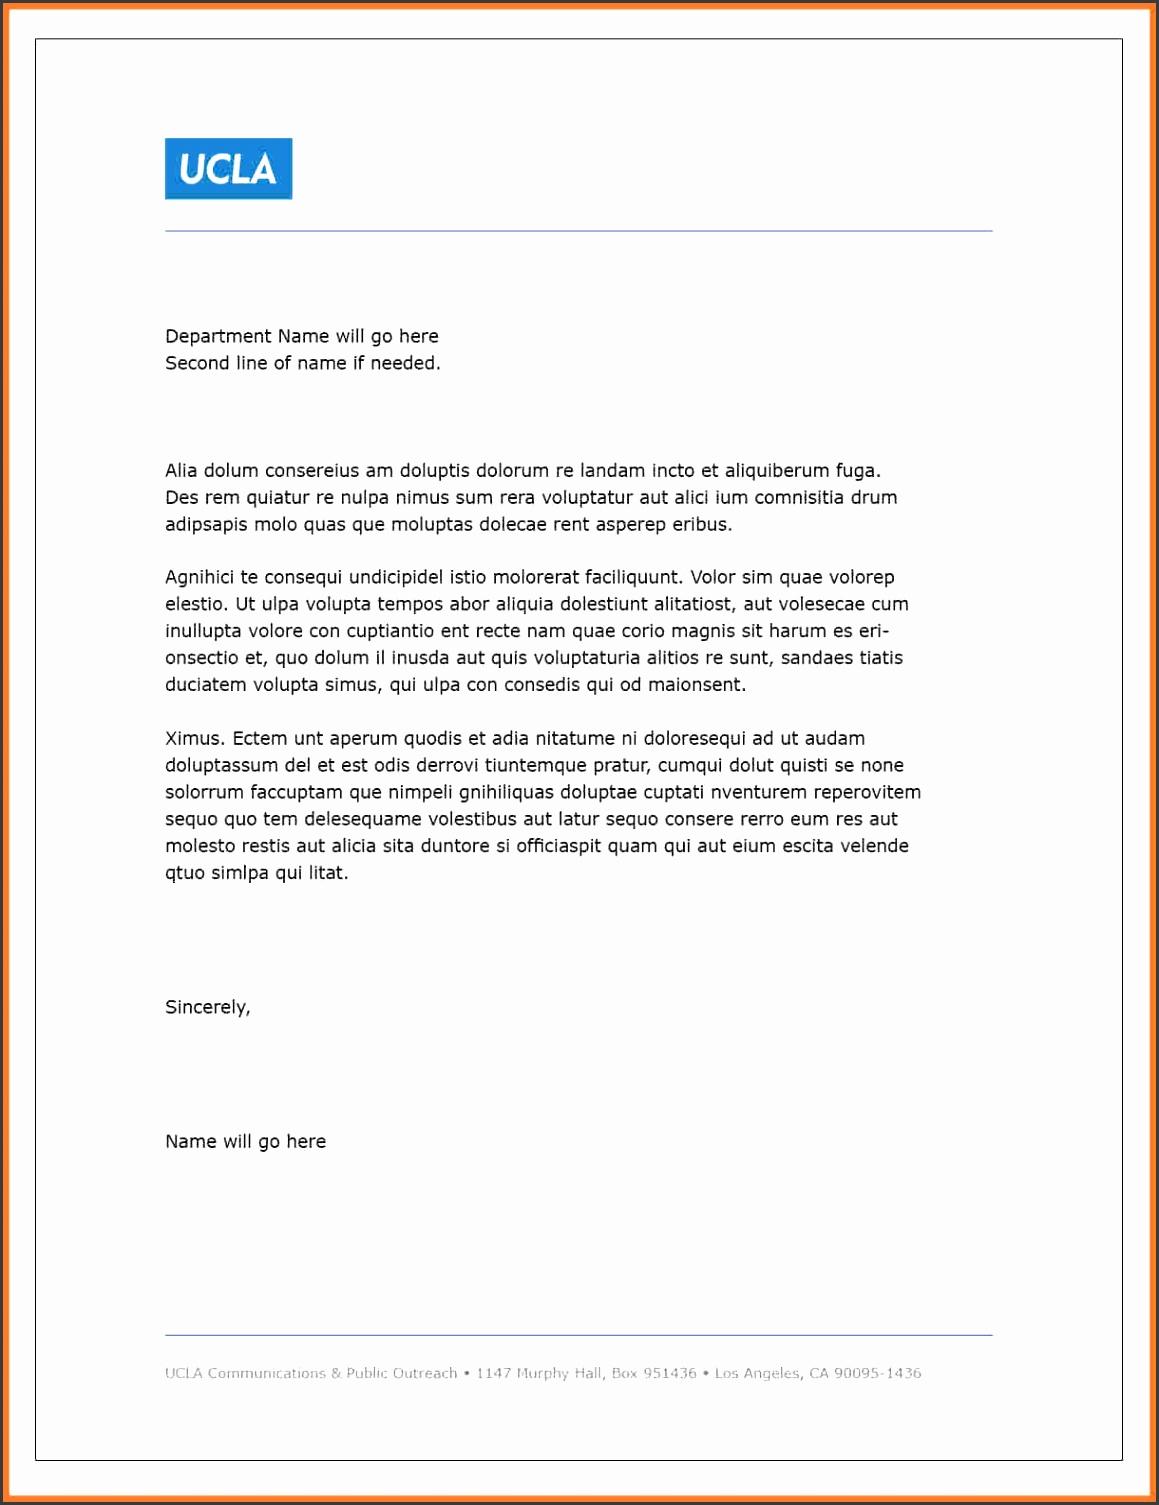 letterhead templates in word Simple Letterhead Template 5